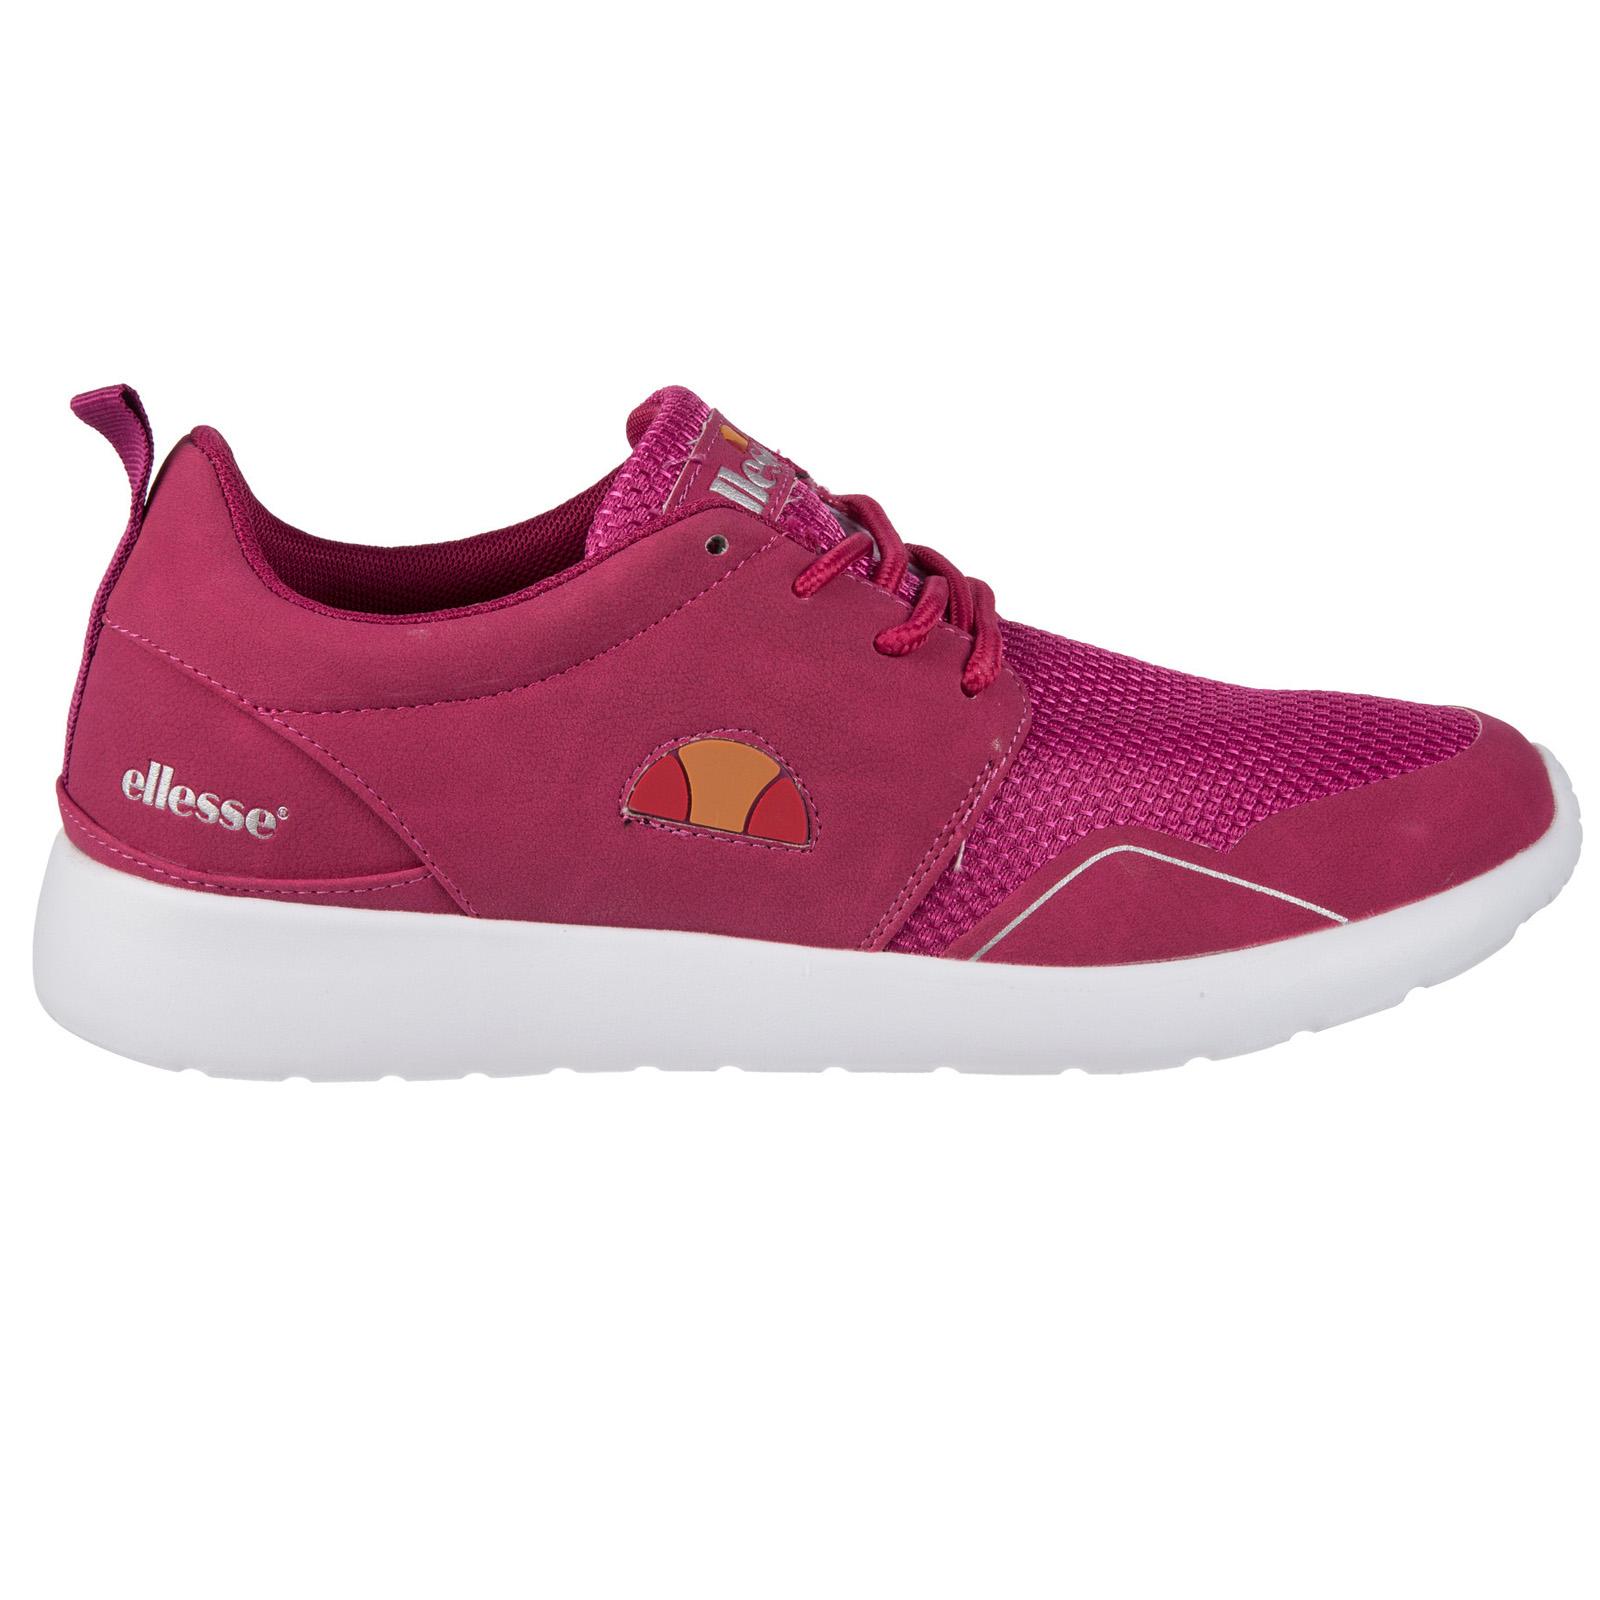 Ellesse Womens Retro Logo Trainers Run Shoes Casual ...